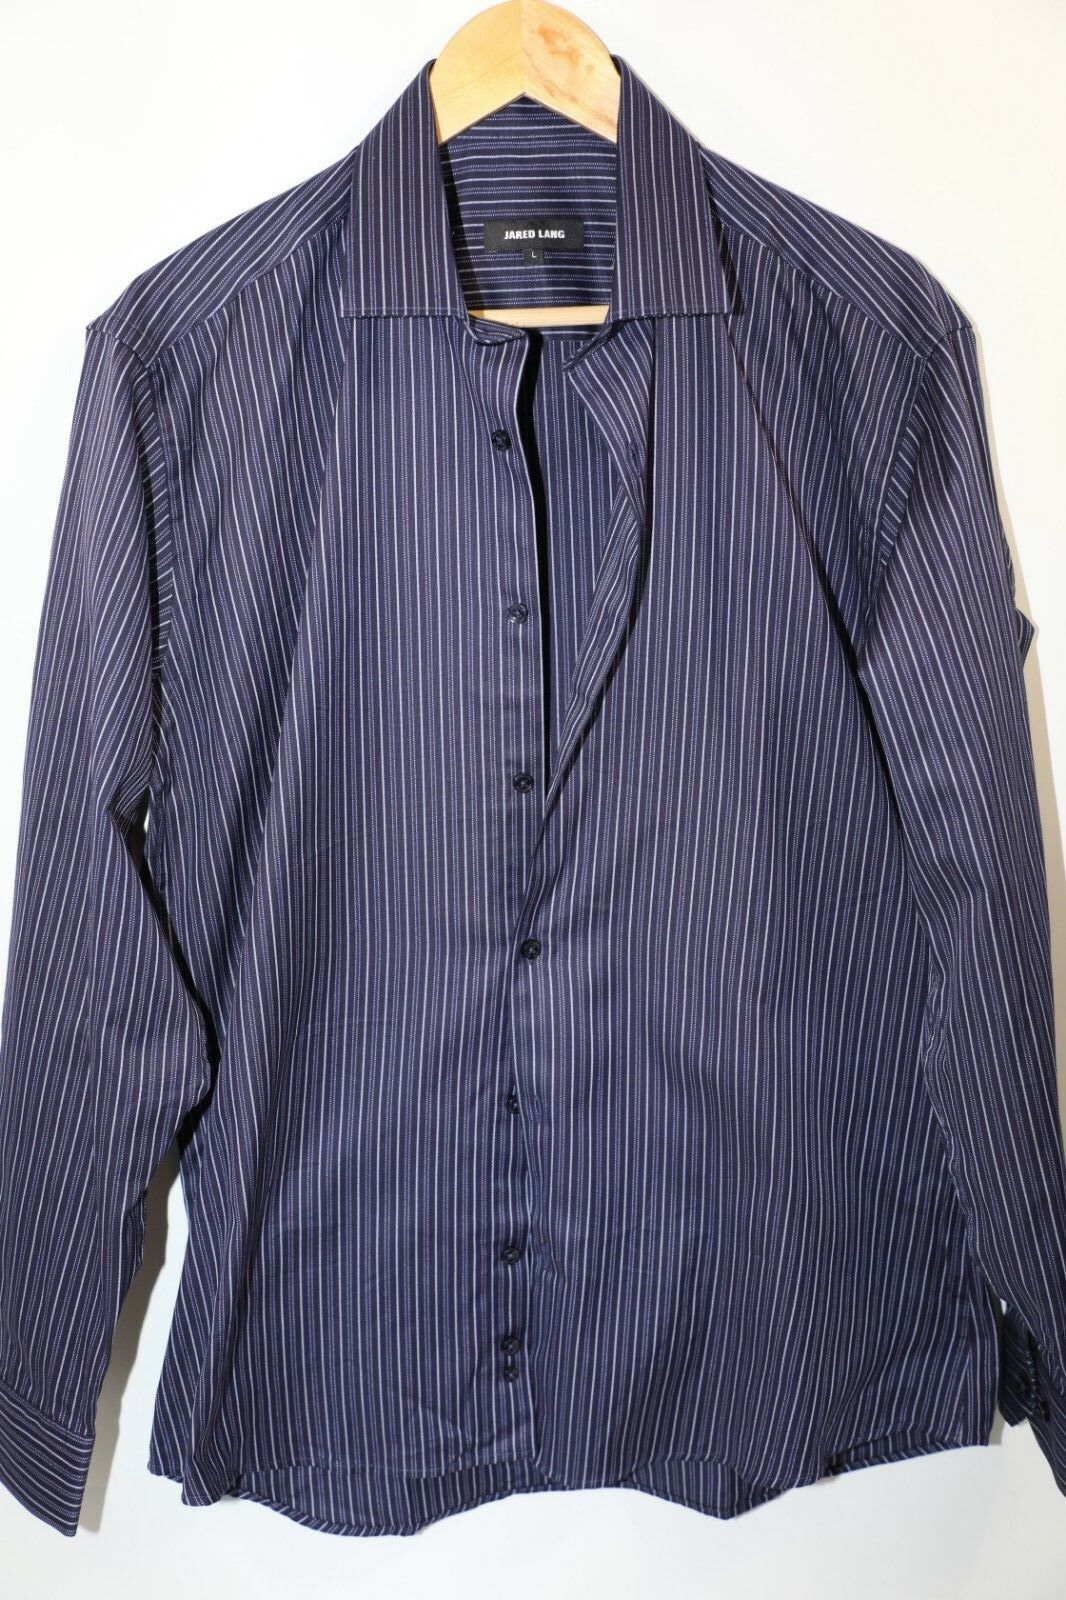 Jared Lang Long Sleeve Sports Shirt Size L